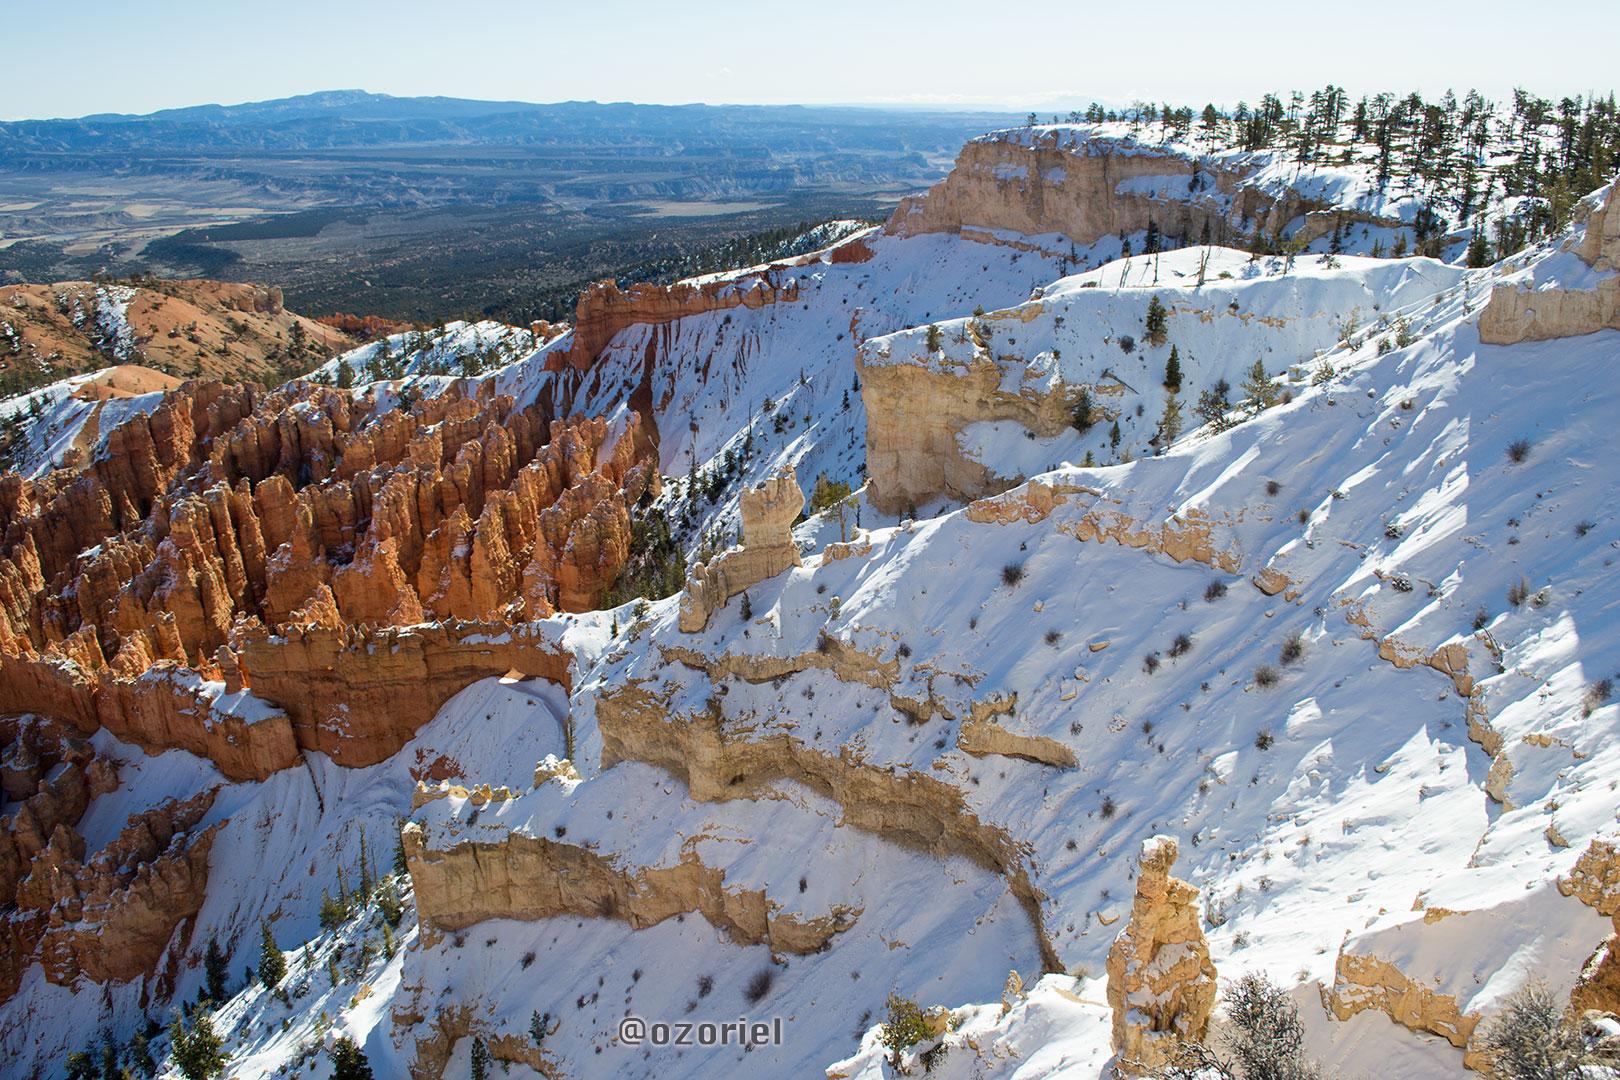 Beautiful Landscape at Bryce Canyon National Park | Utah, USA | feb 2014